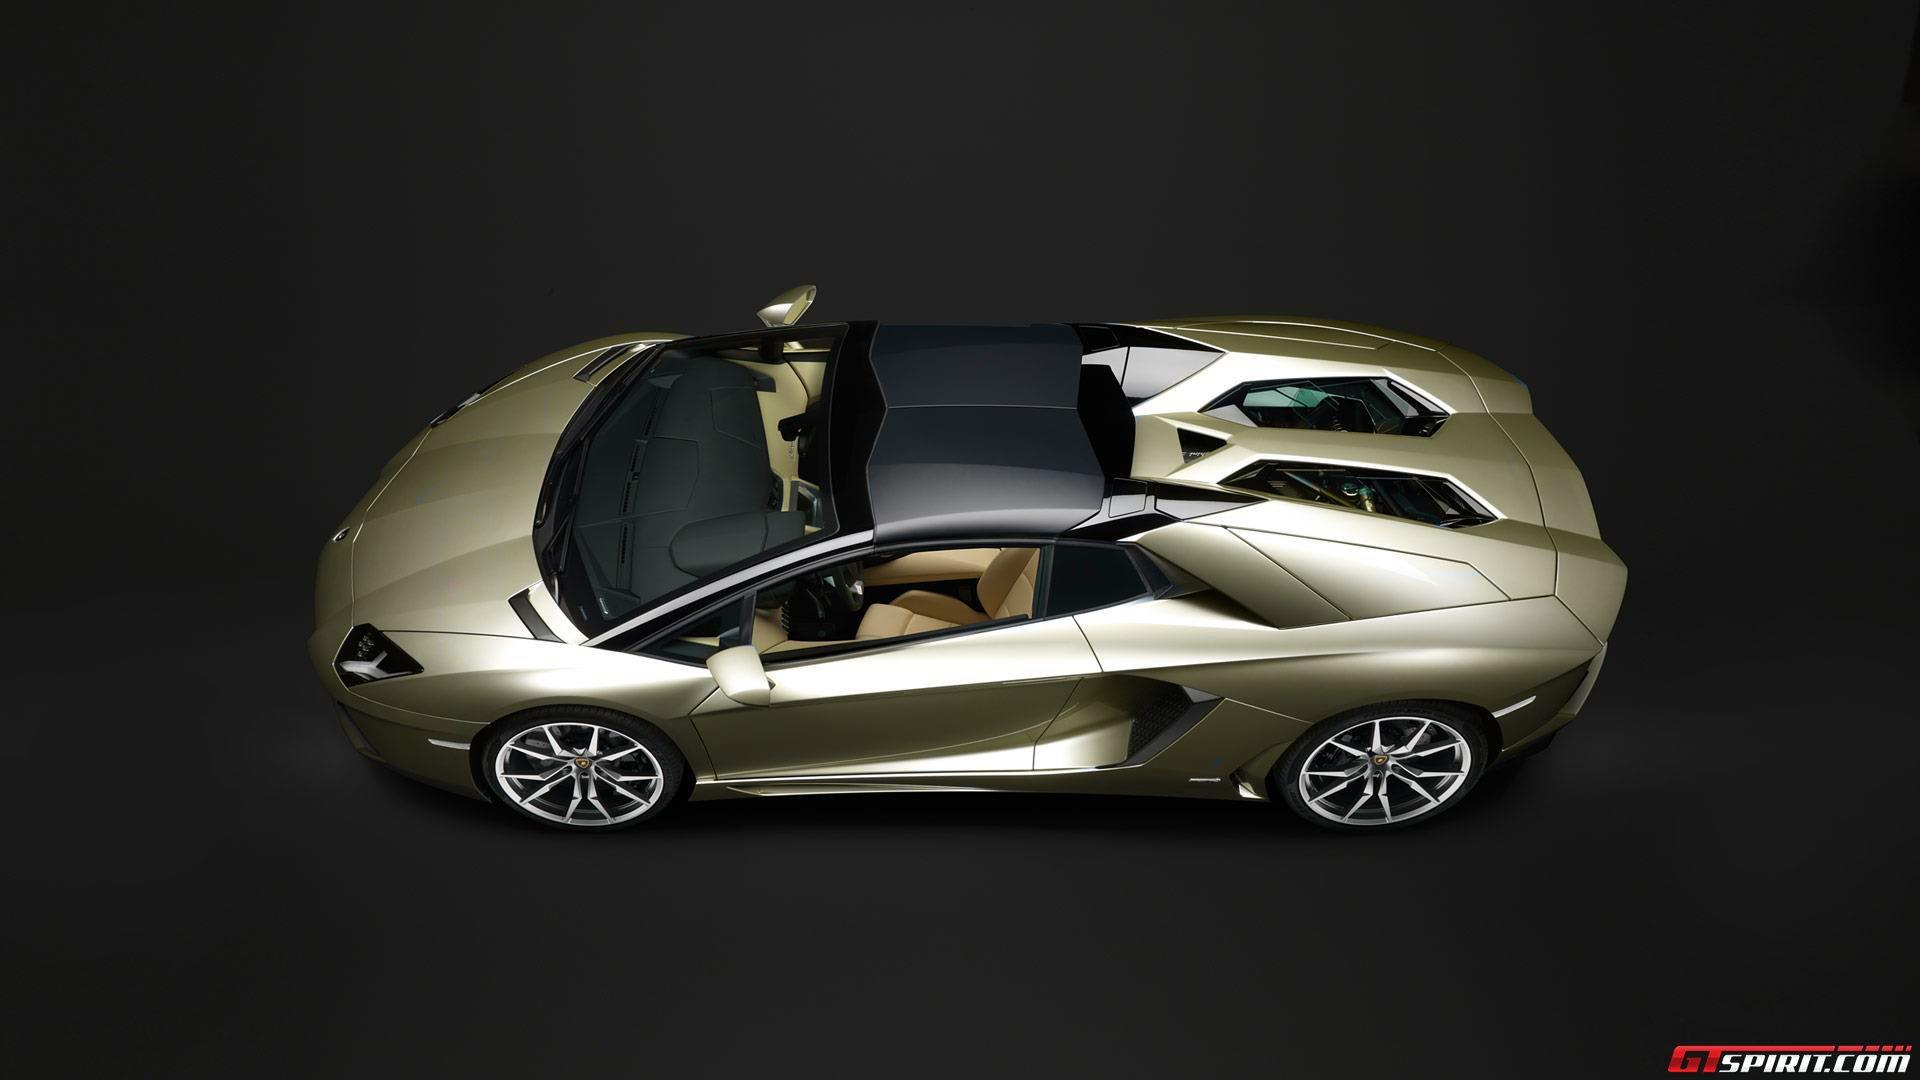 2013 Lamborghini Aventador Roadster Colors Photo 12